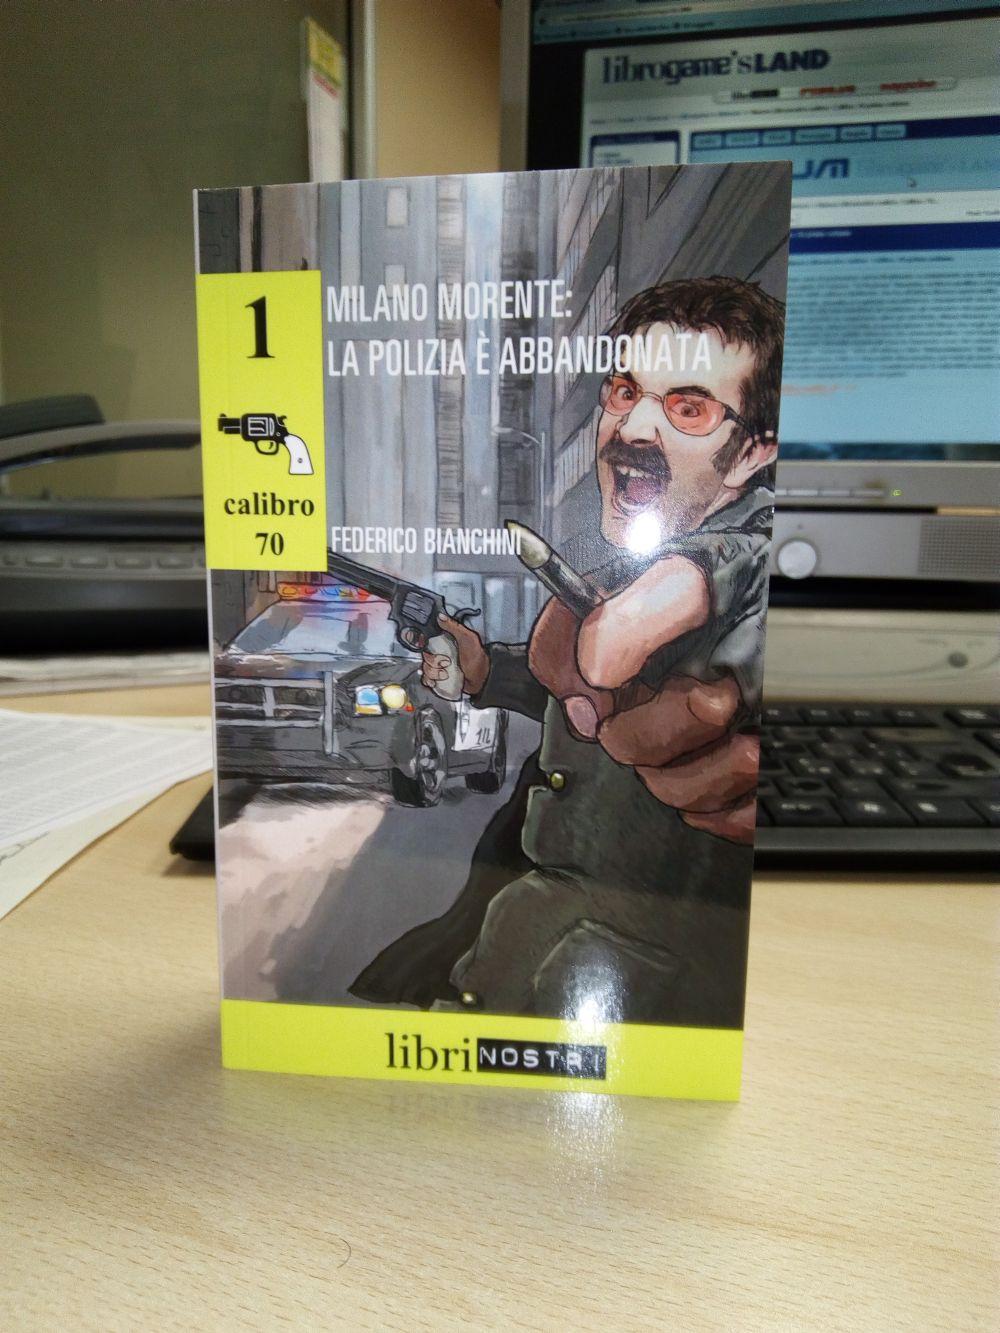 http://www.librogame.net/images/homepage/c7001.jpg